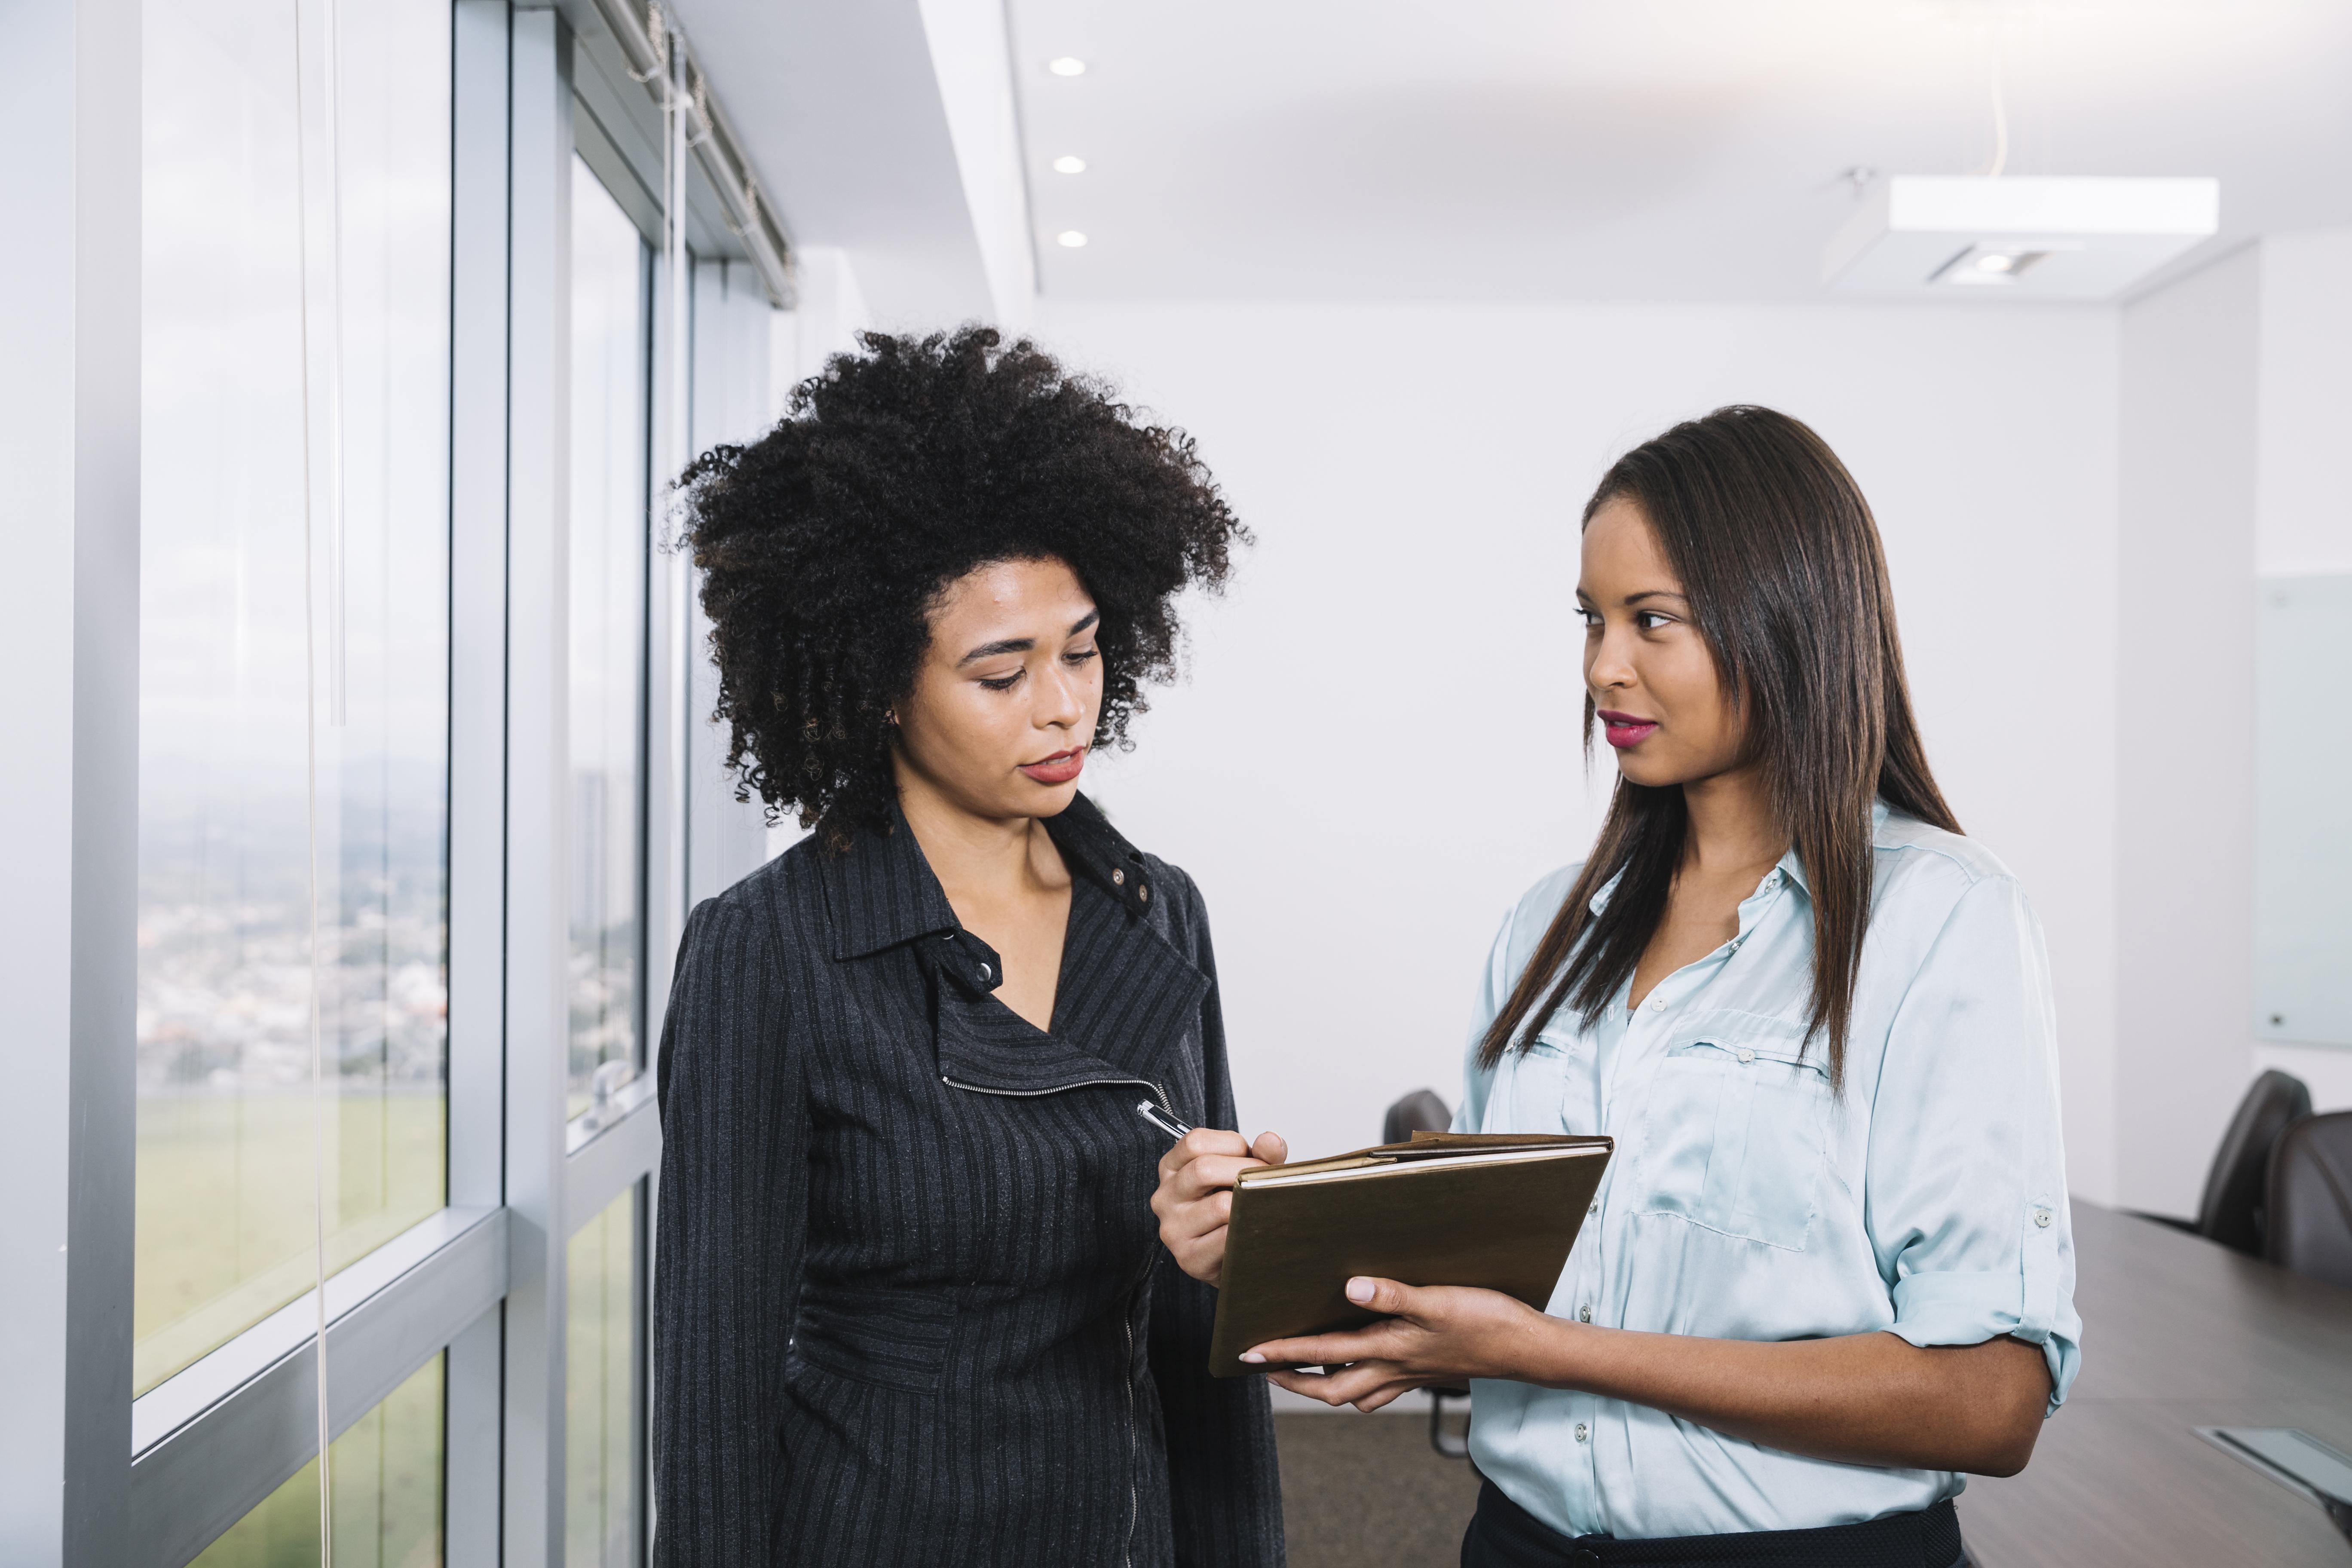 Black businesse$, Black consumer$: A necessary alliance